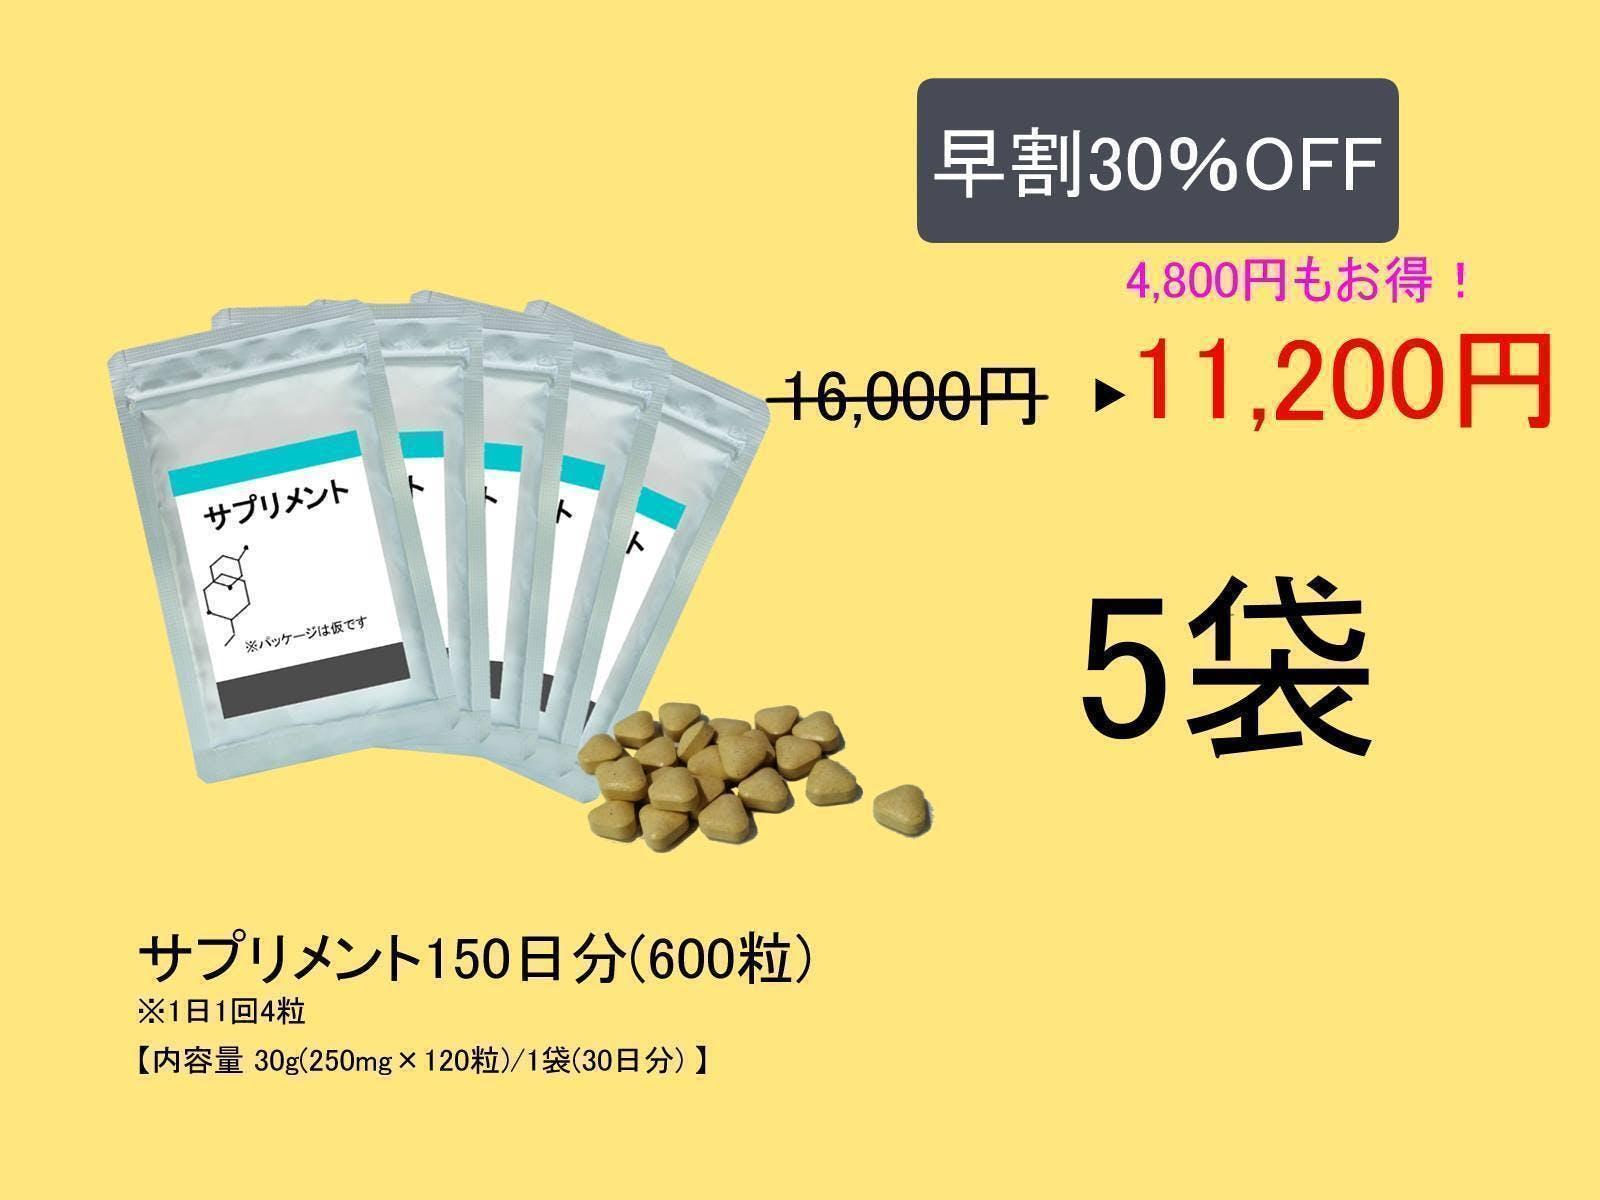 11200円